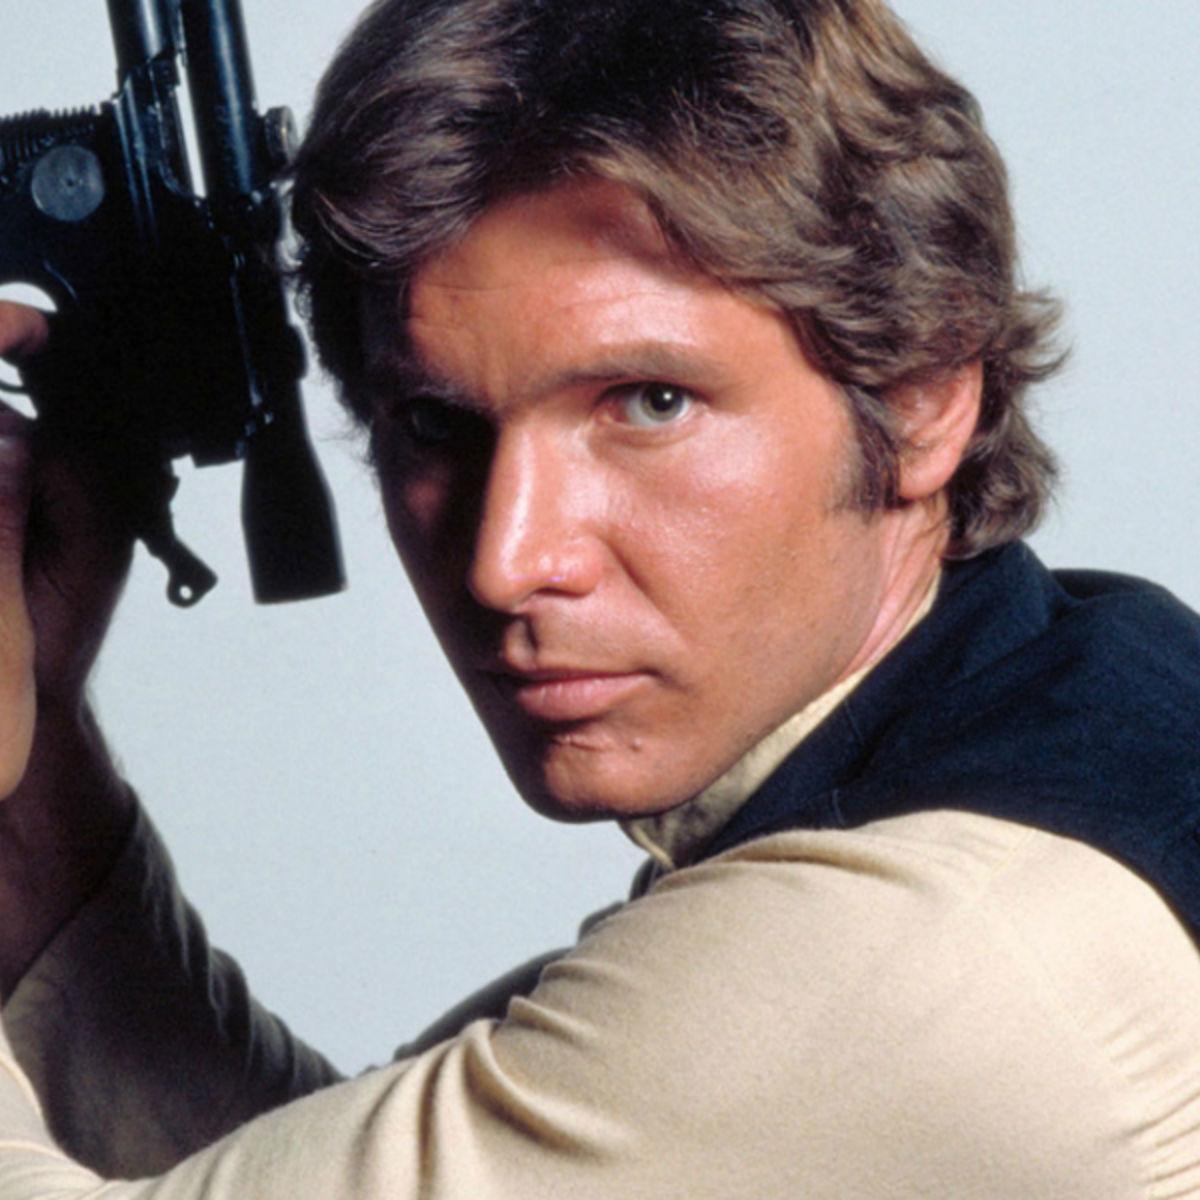 Han-Solo-Harrison-Ford.jpg